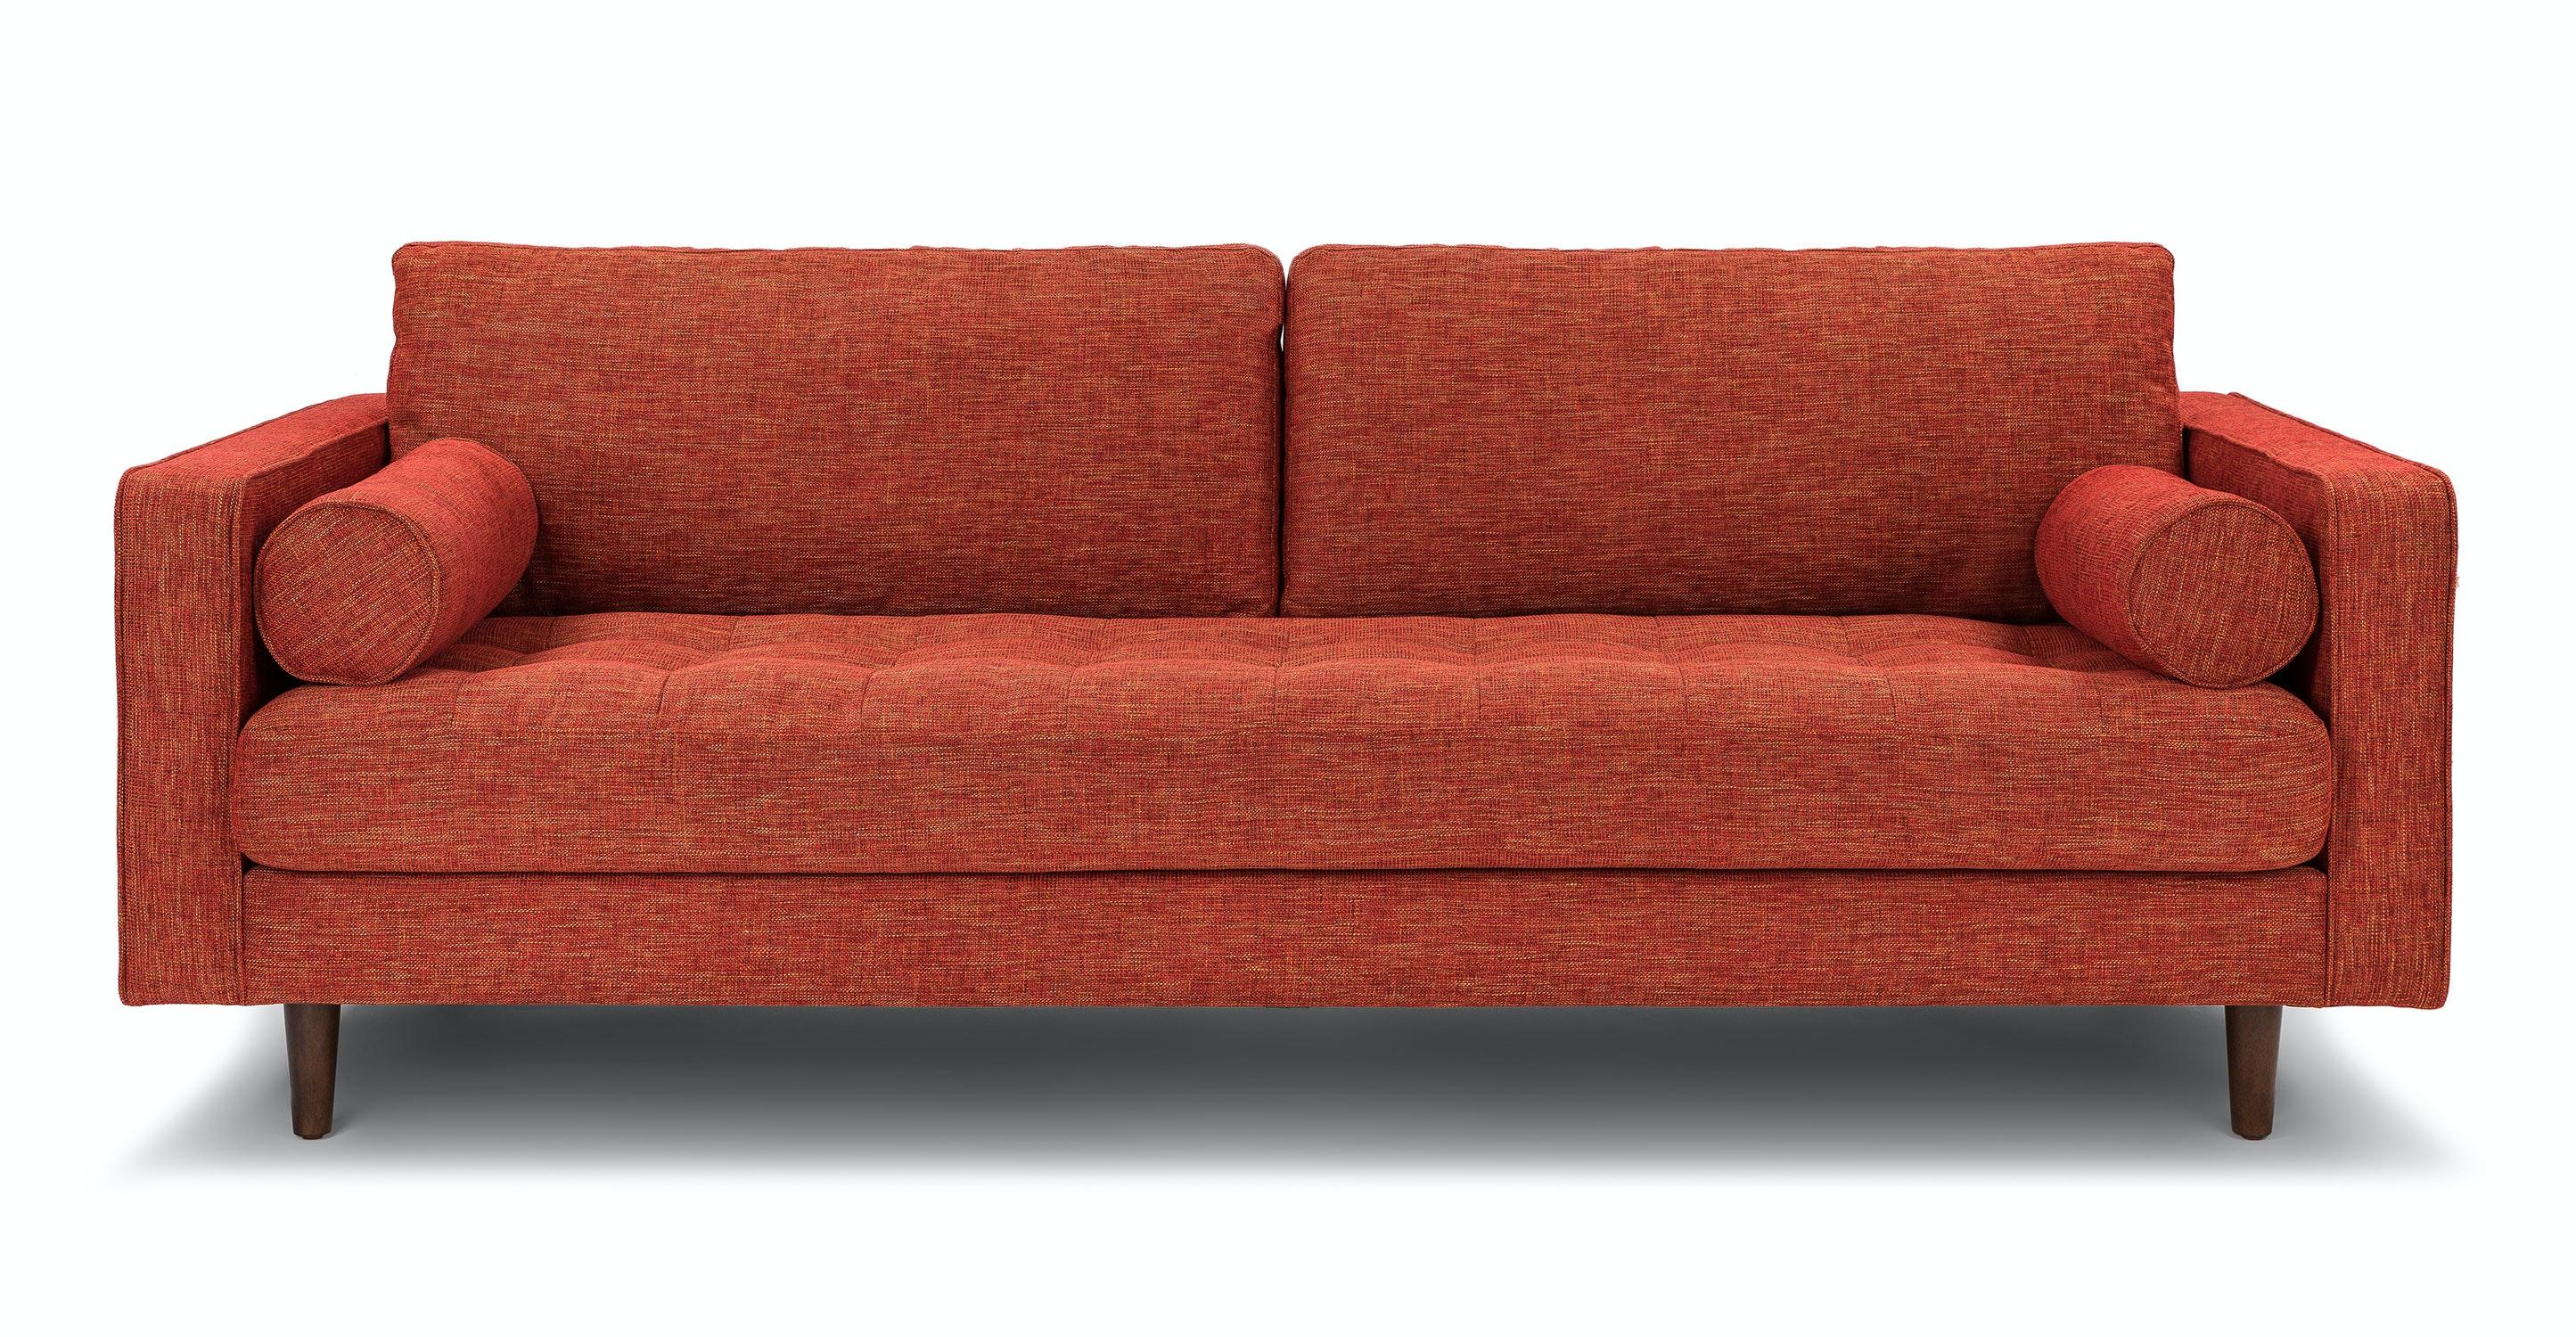 Sven Salsa Orange Sofa | Article